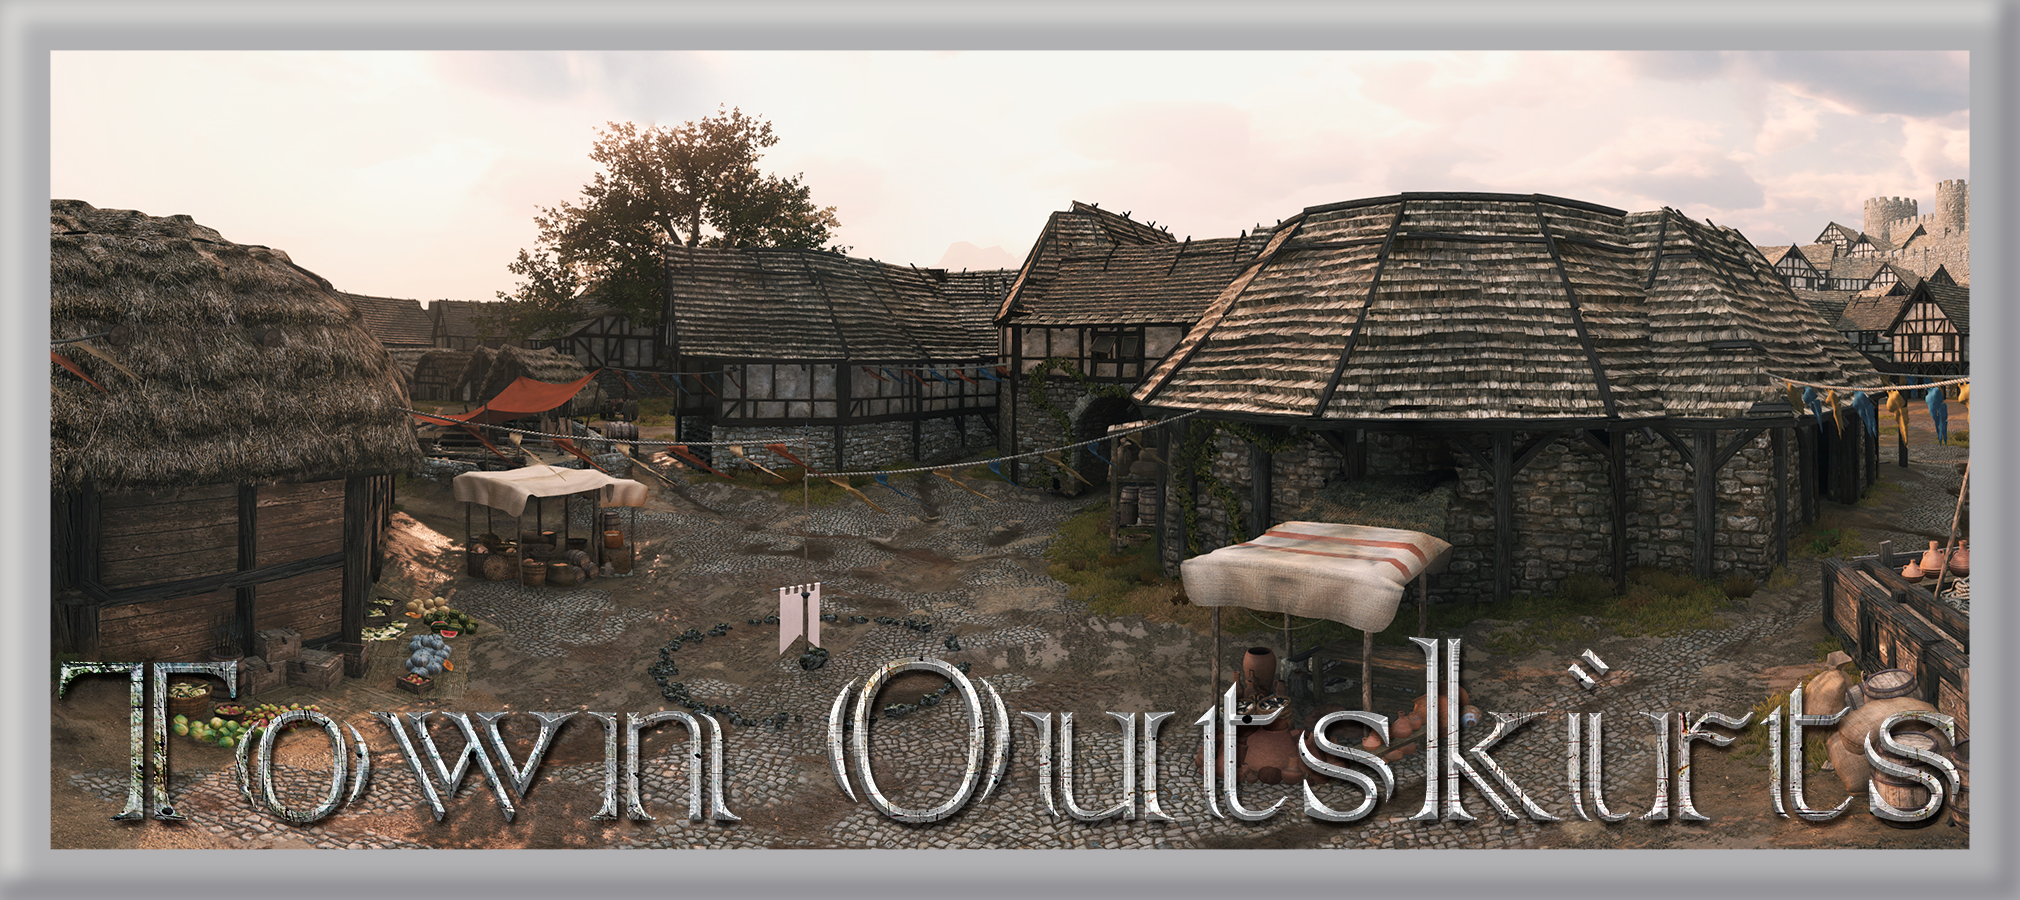 Town-Outskirts-frame-Aero.png